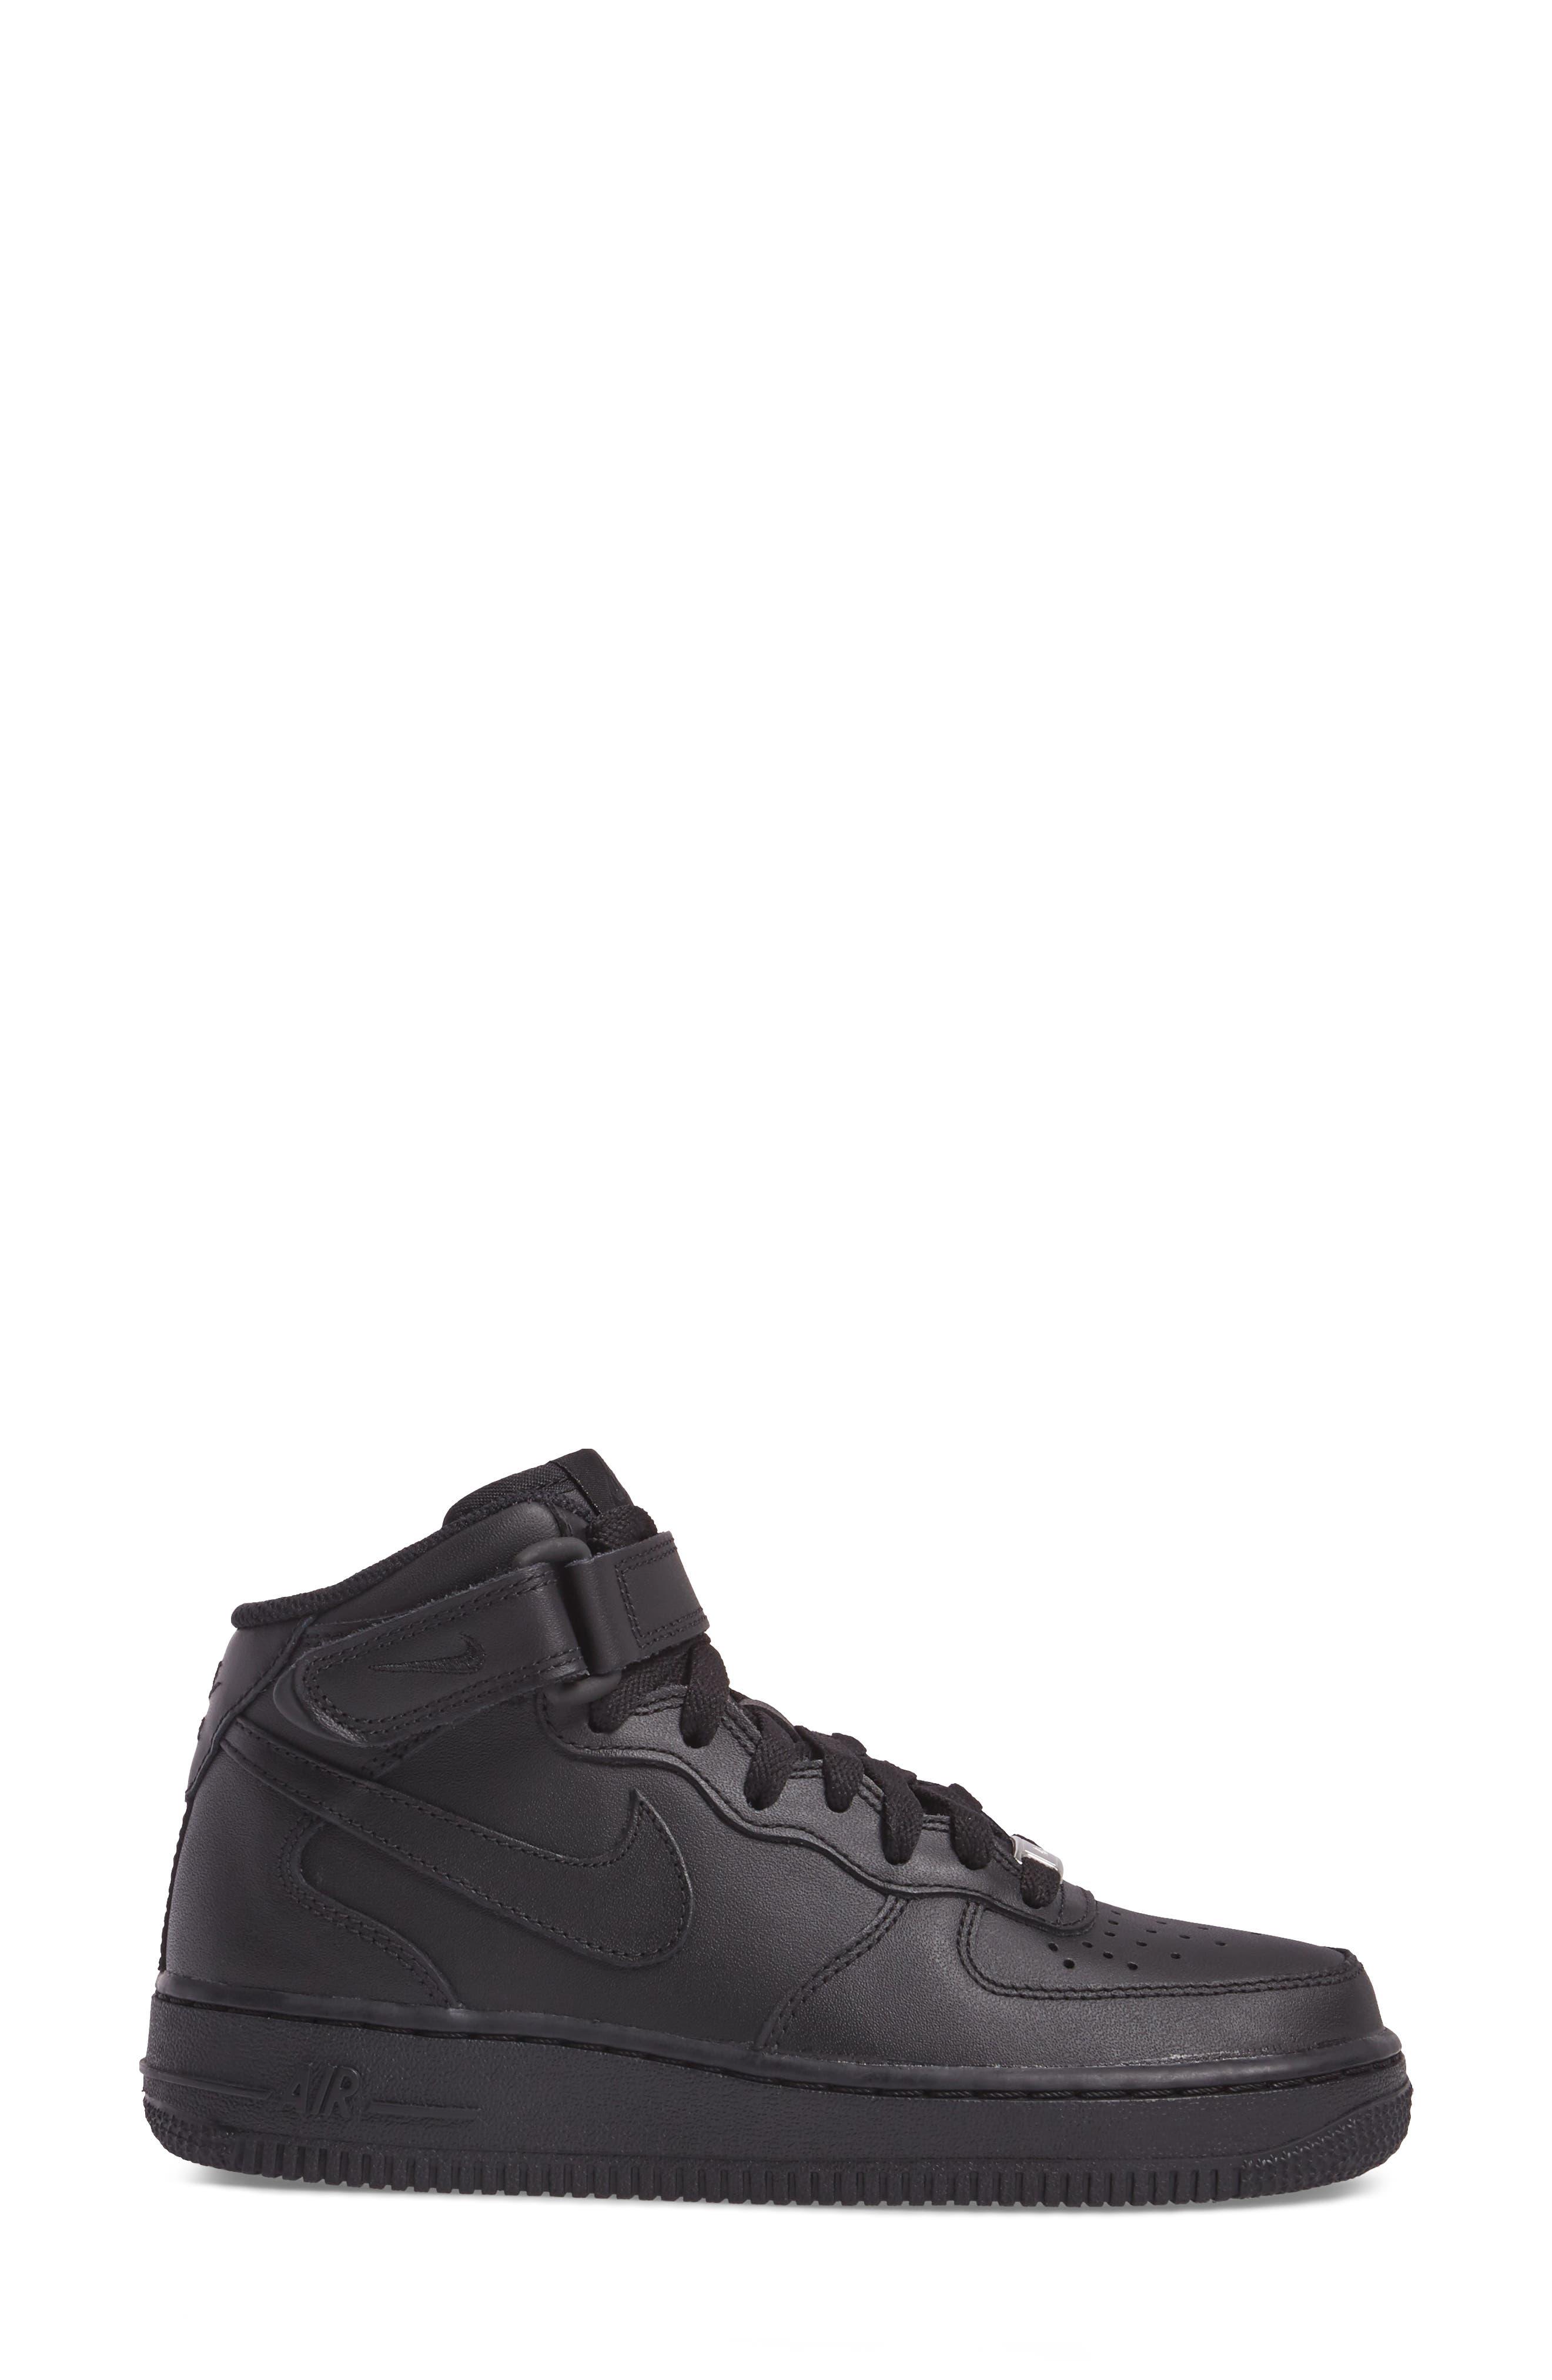 Air Force 1 '07 Mid Sneaker,                             Alternate thumbnail 3, color,                             BLACK/ BLACK